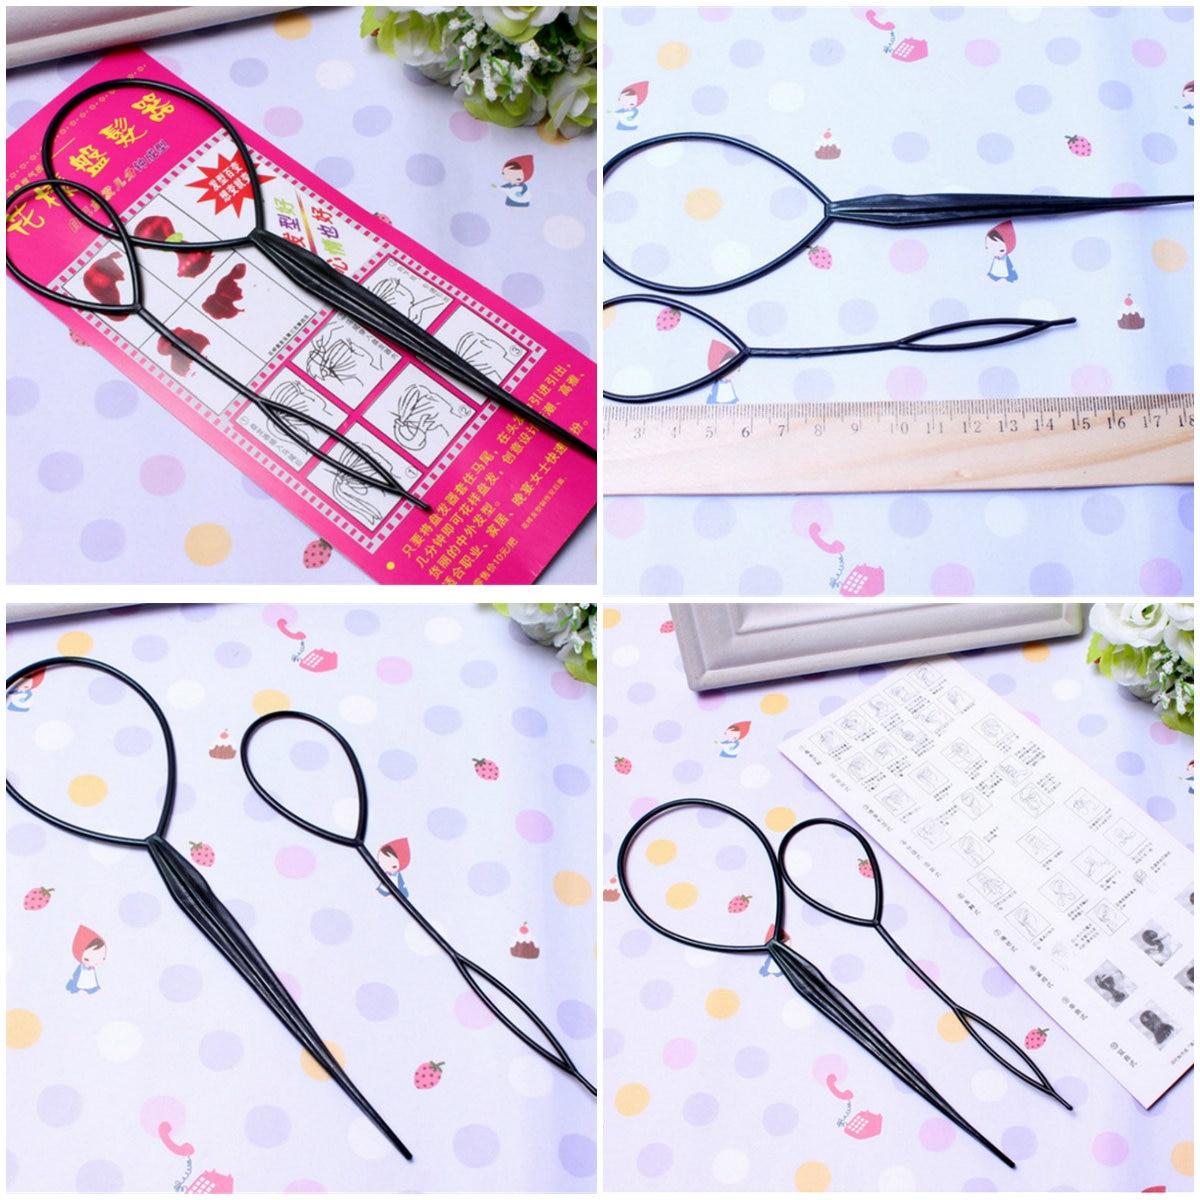 2Pcs Plastic Loop Styling ToolsBlack Ponytail Creator Tail Clip Hair Braid Maker Styling Tool Fashion Salon